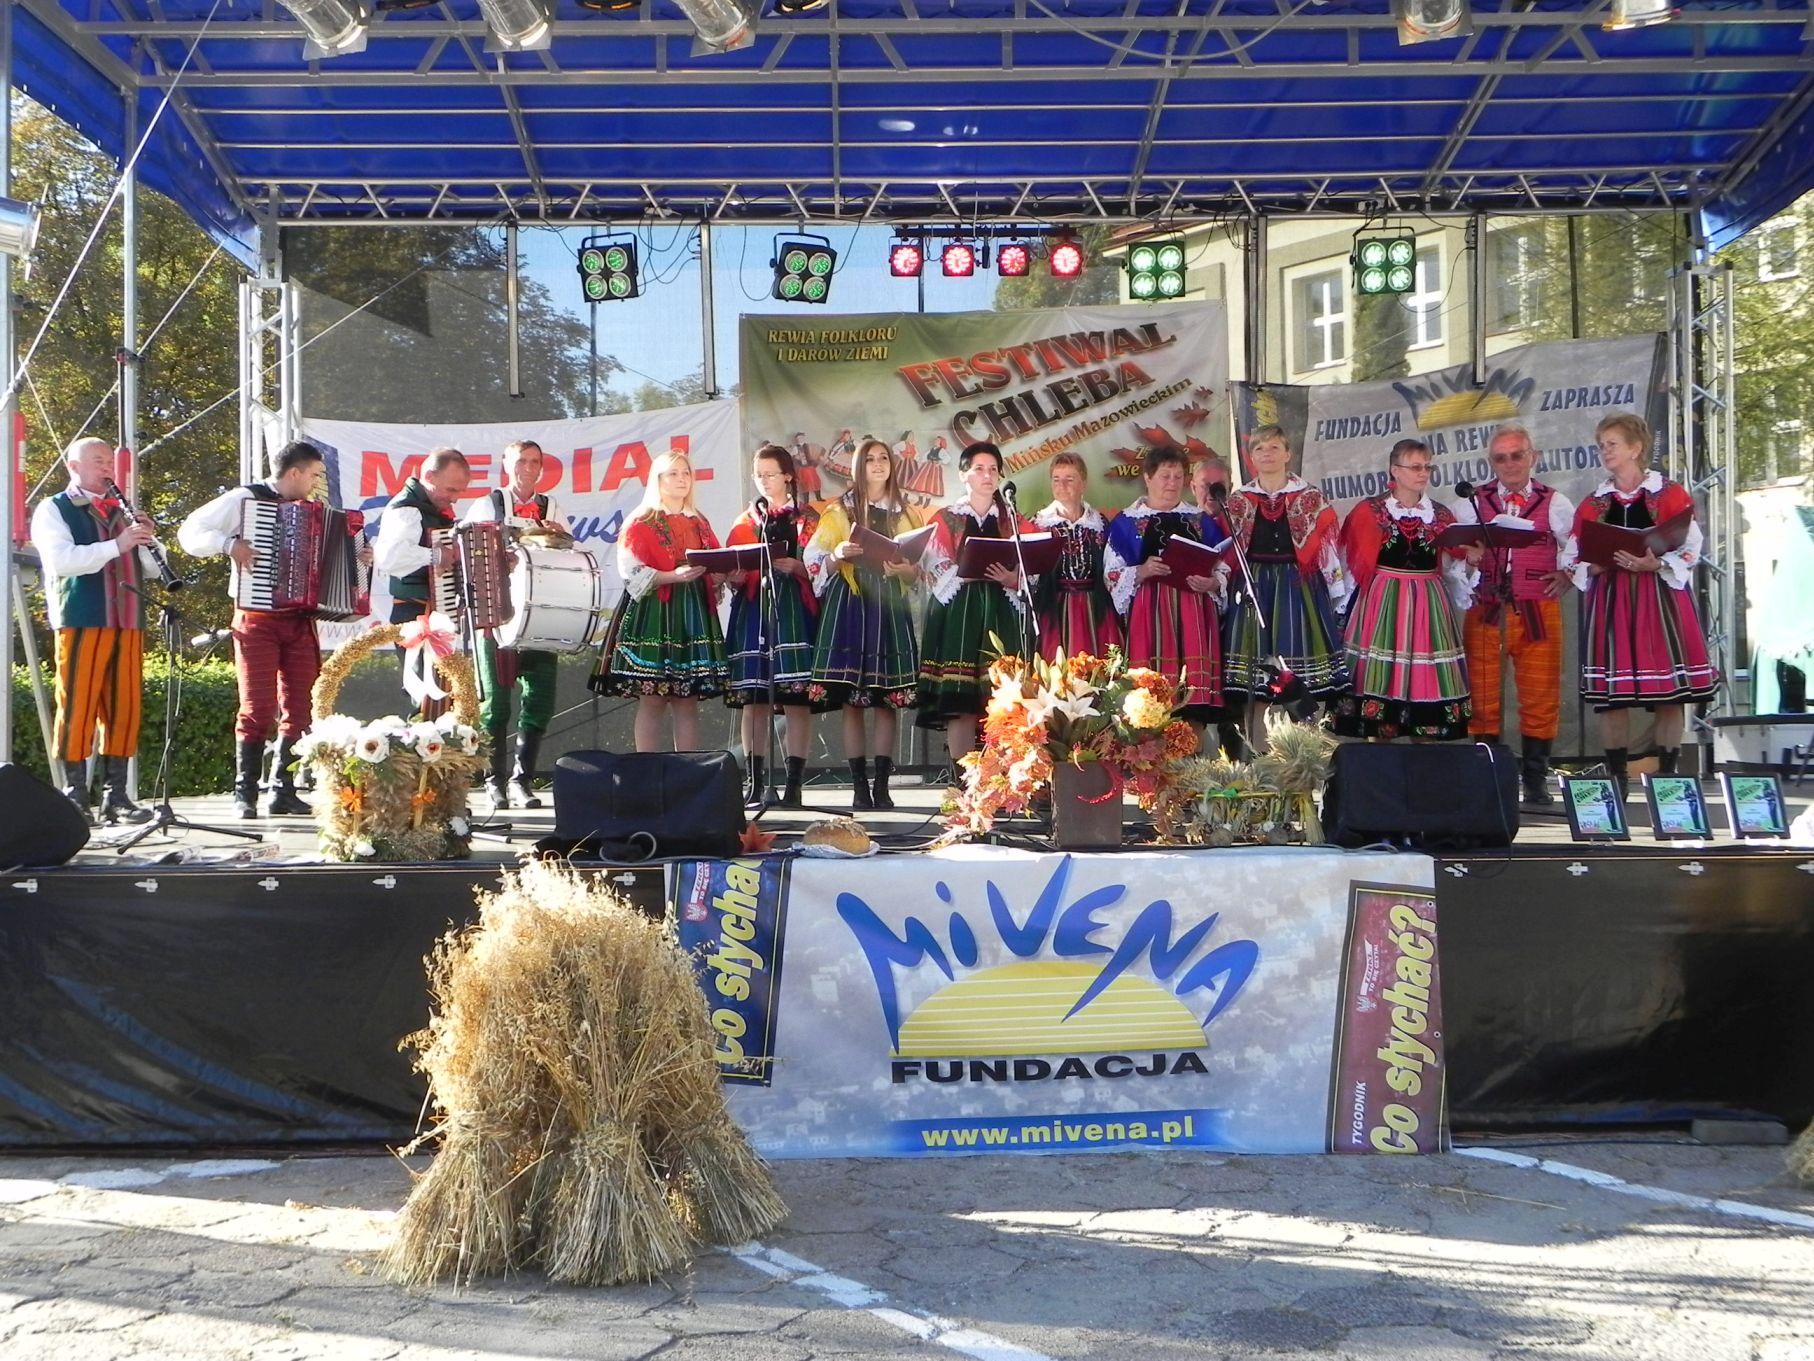 2013-09-10 Festyn - Mińsk Maz (85)